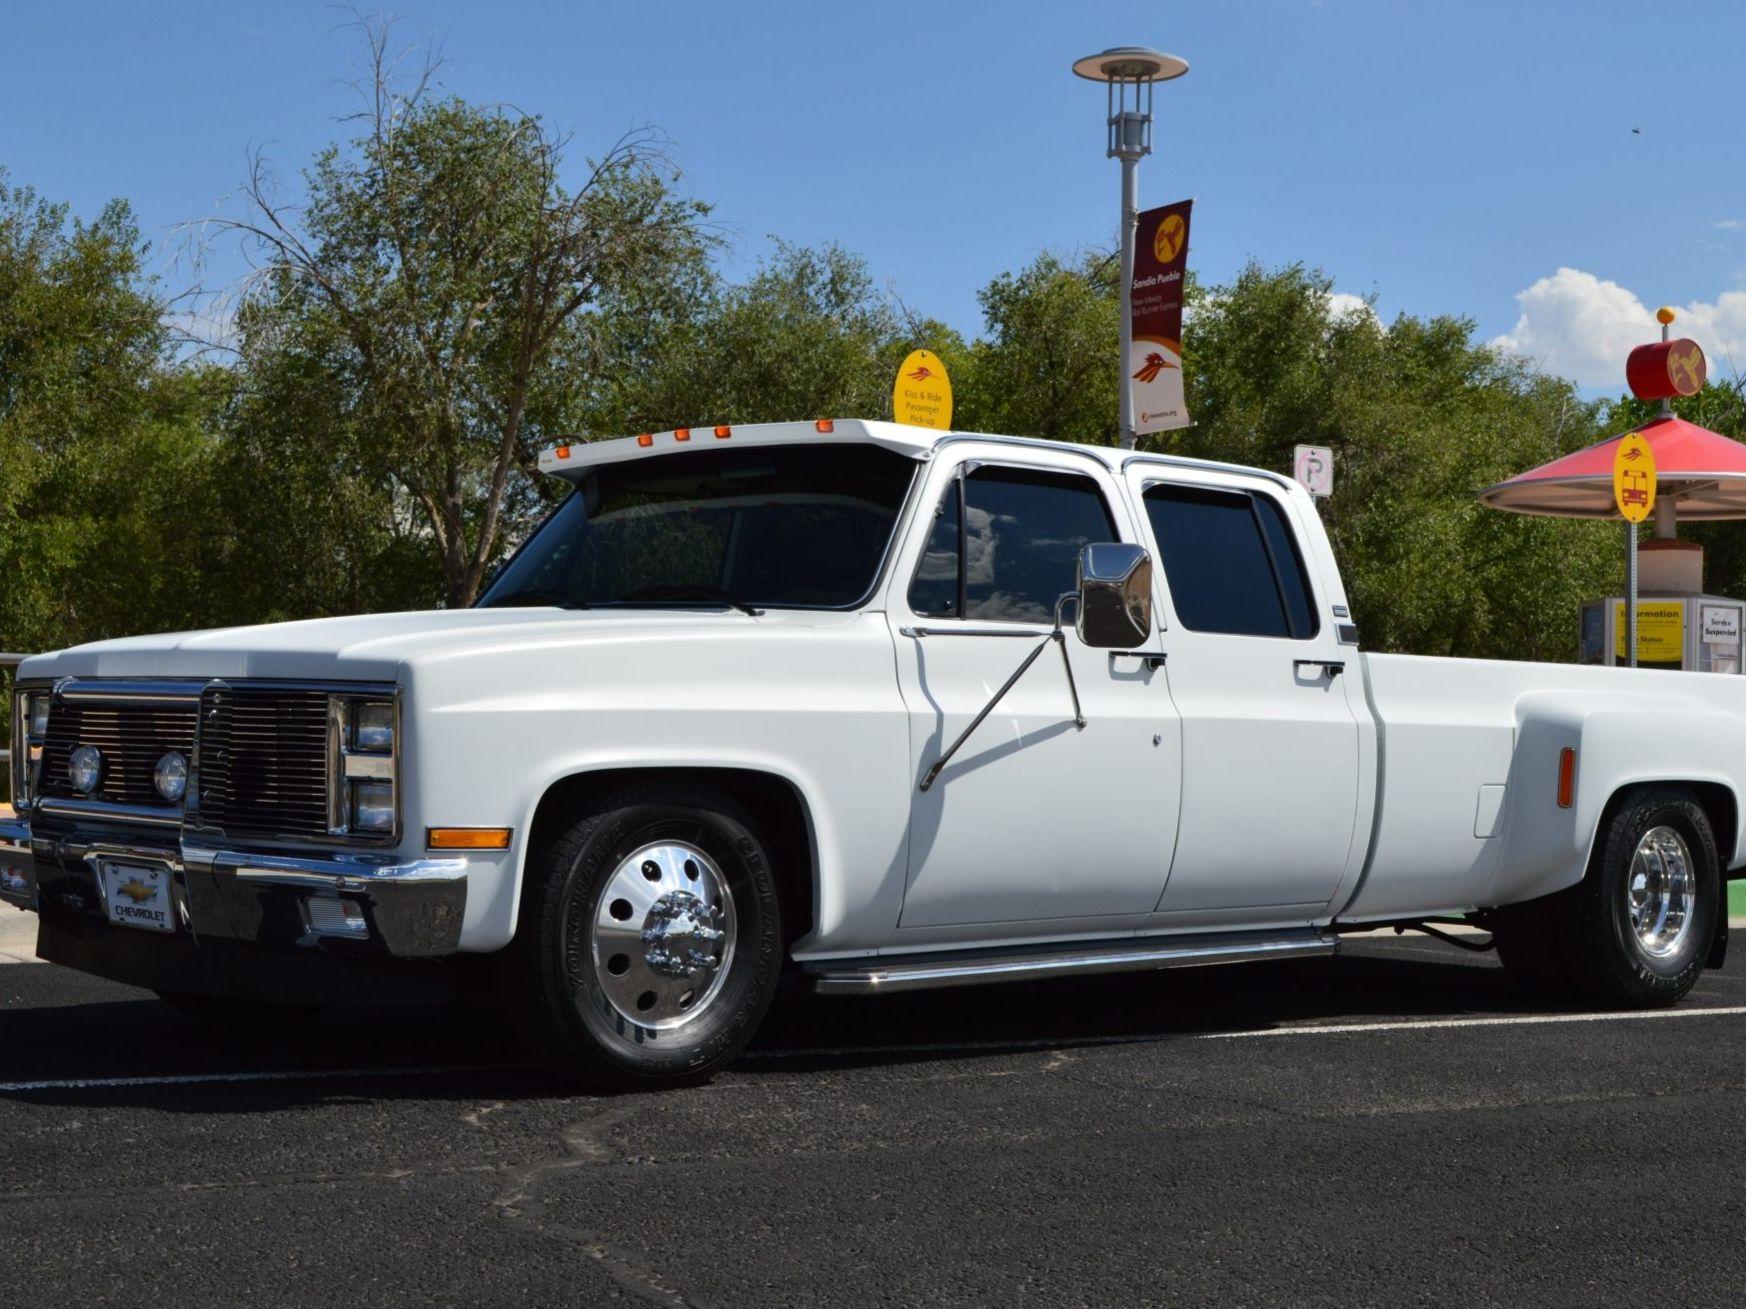 1987 Chevrolet R30 One-Ton Crew Cab Dually 5-Speed